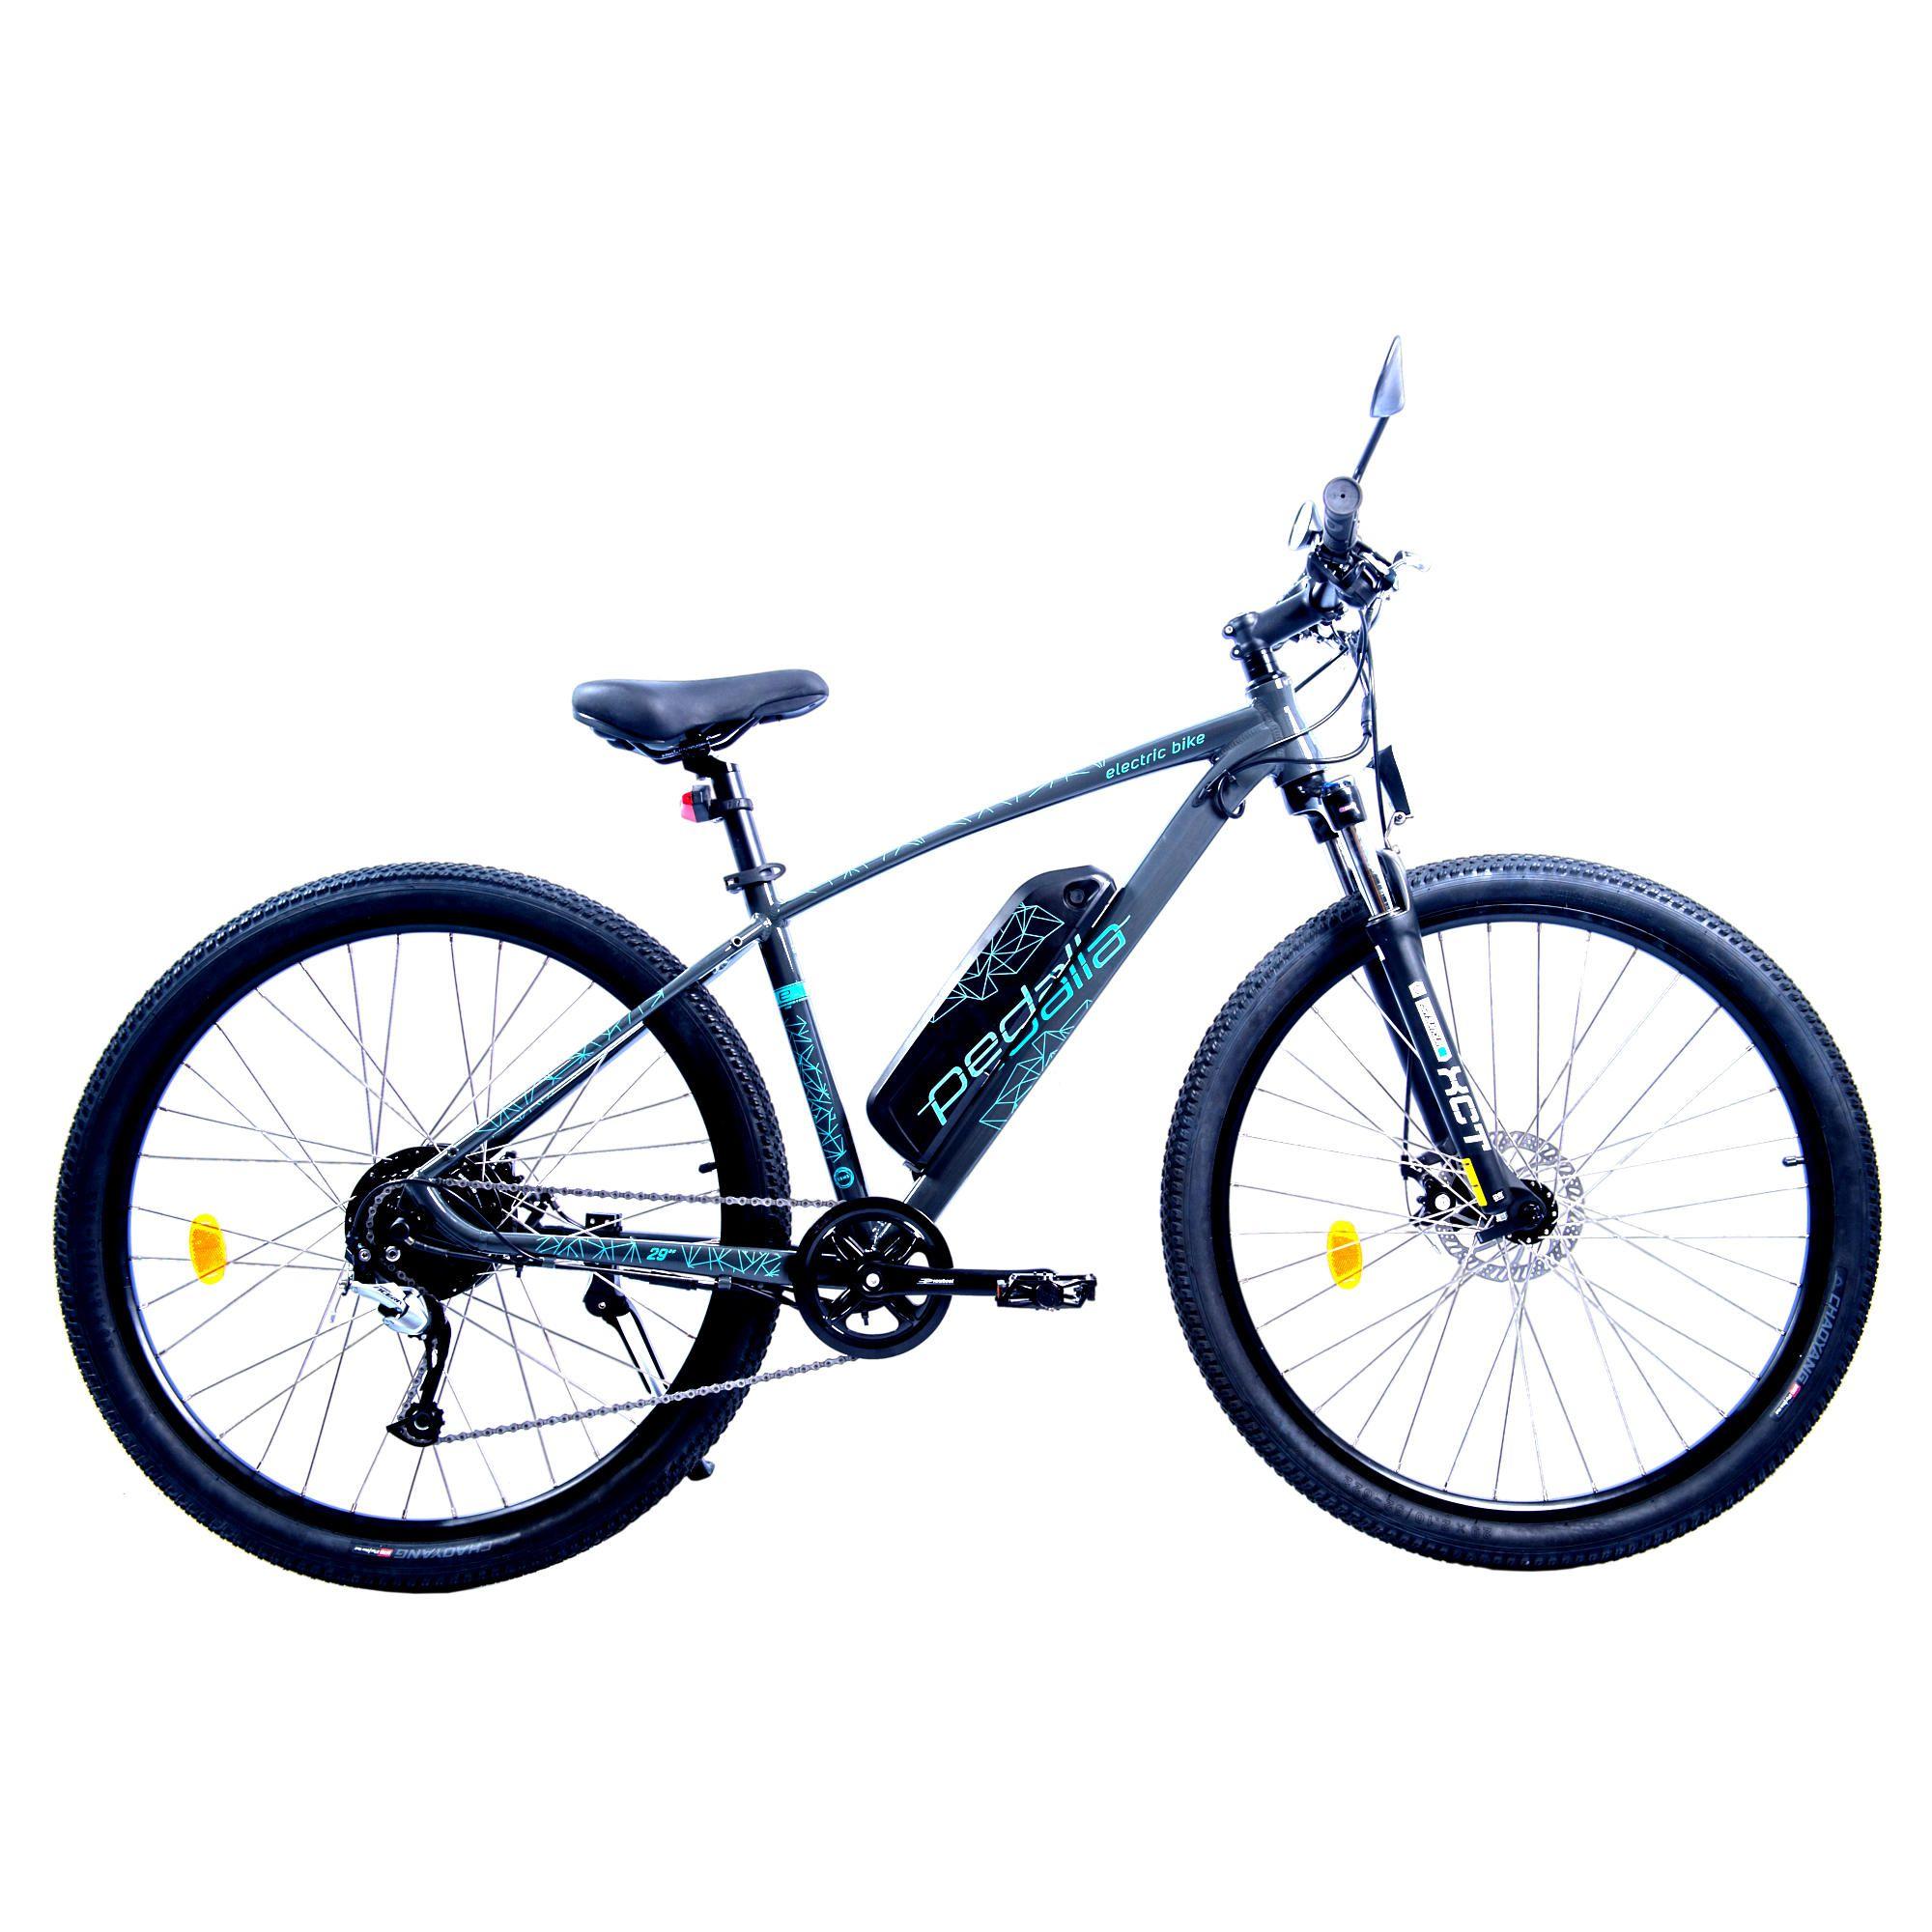 Bicicleta Elétrica Pedalla Agilità Plus